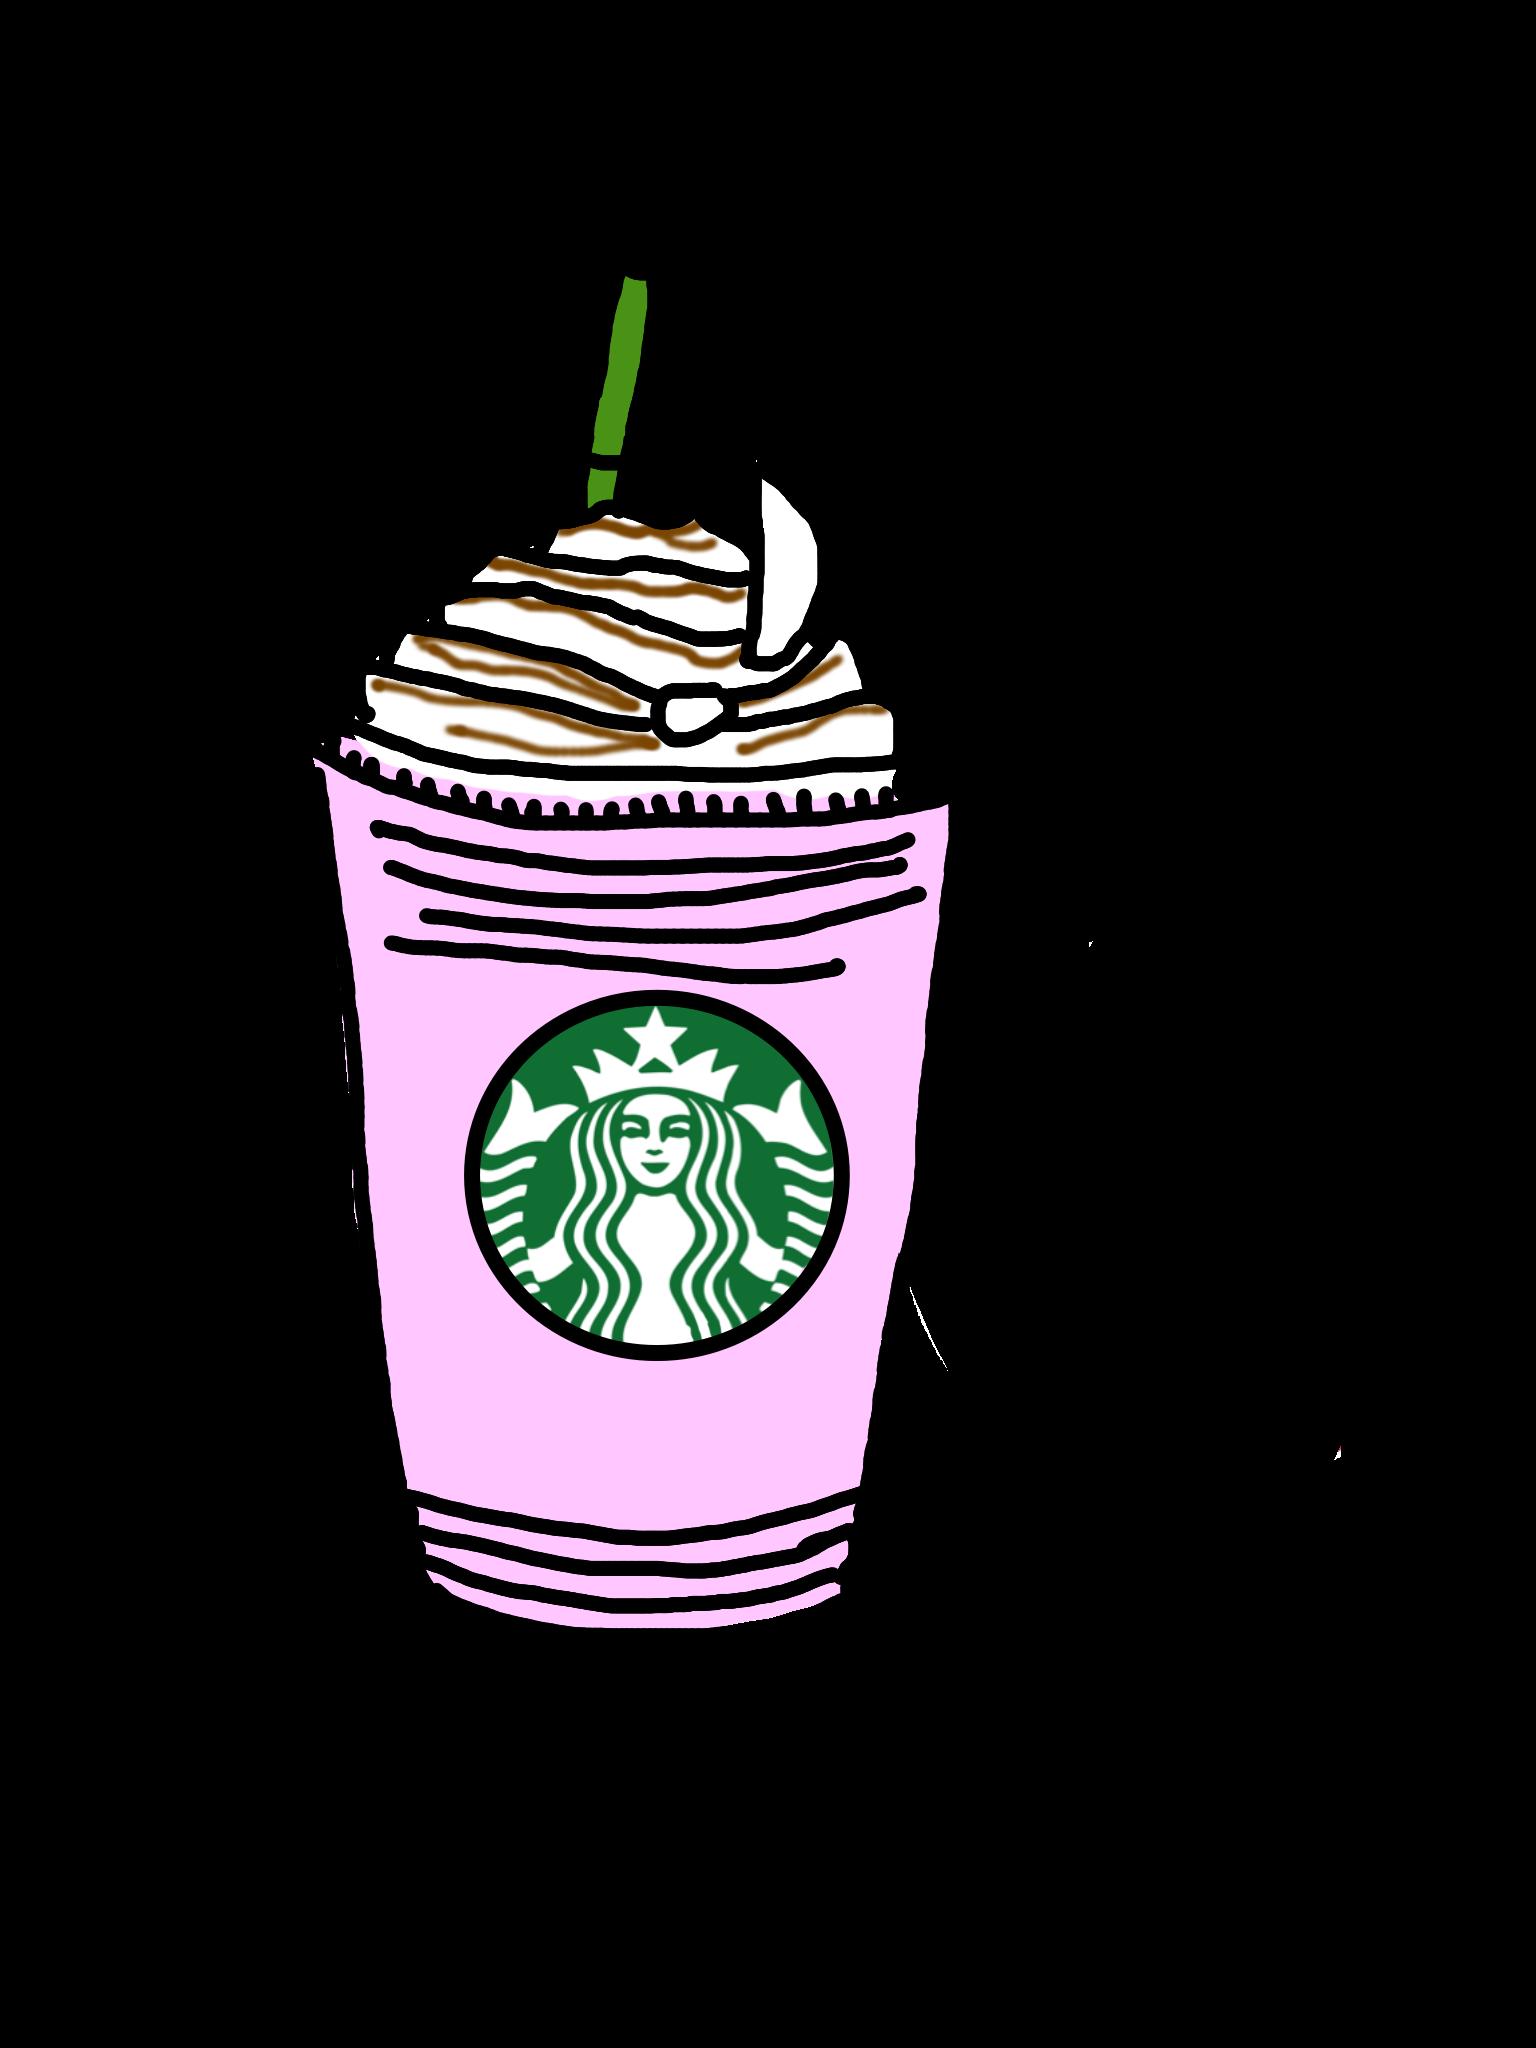 starbucks drink tumblr pink whippedcream logo cute past...